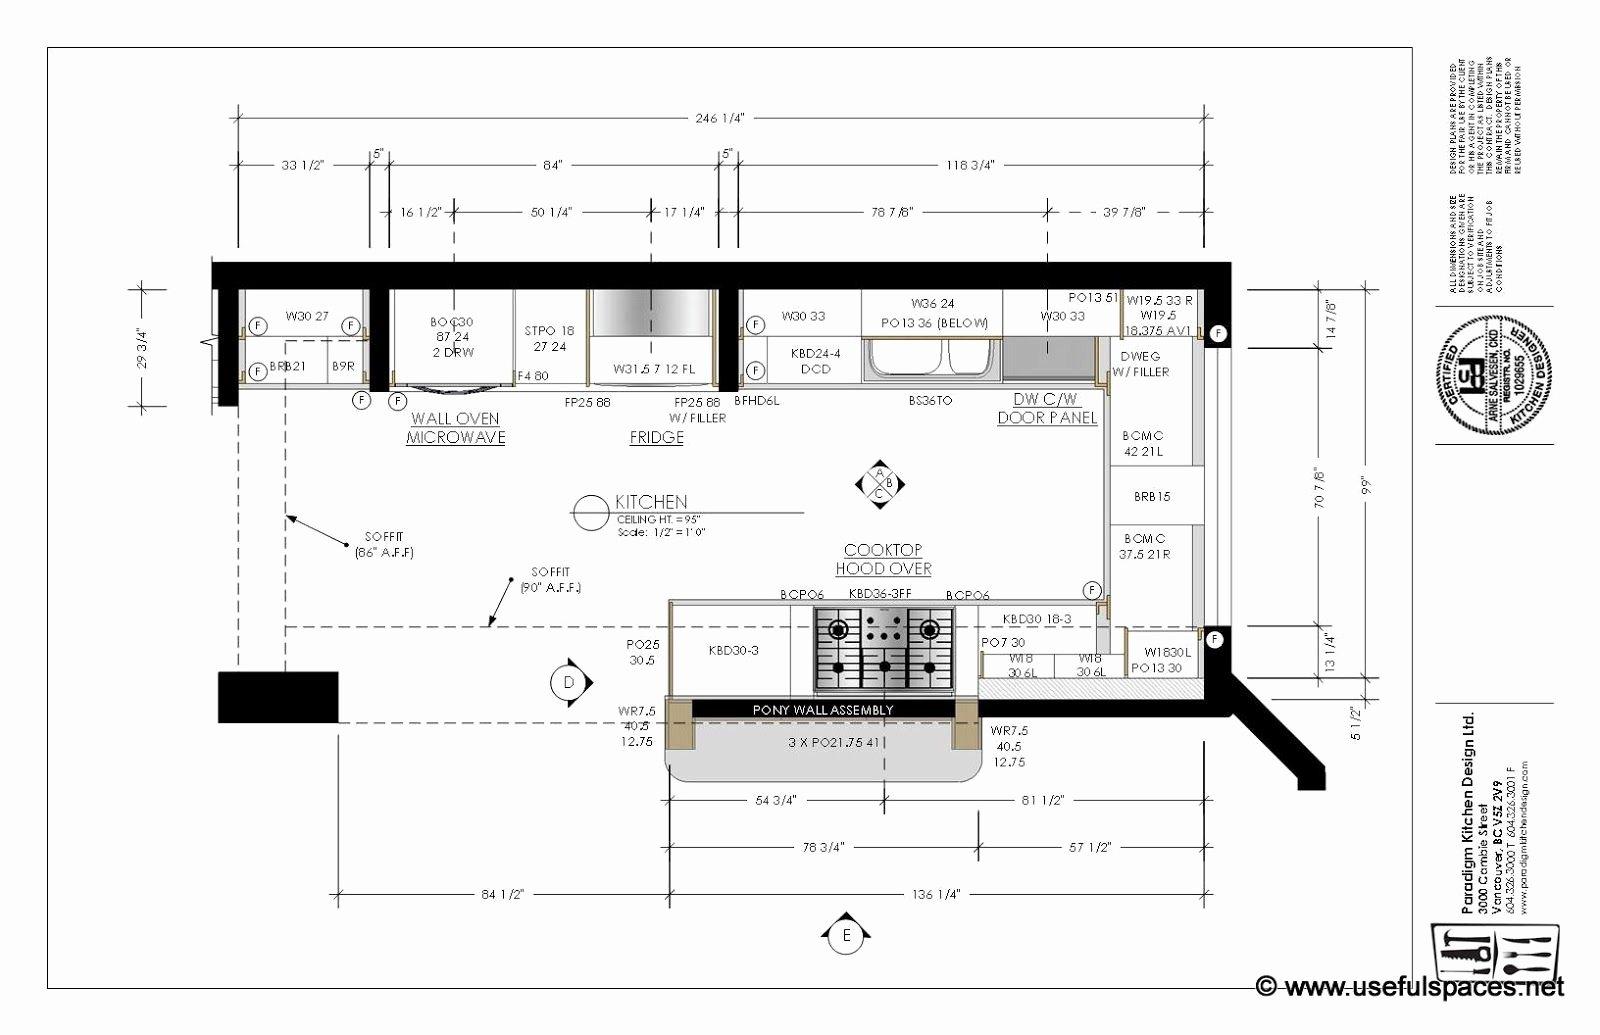 Restaurant Floor Plan Template Awesome Kitchen Layout Templates Restaurant Floor Plan Samples